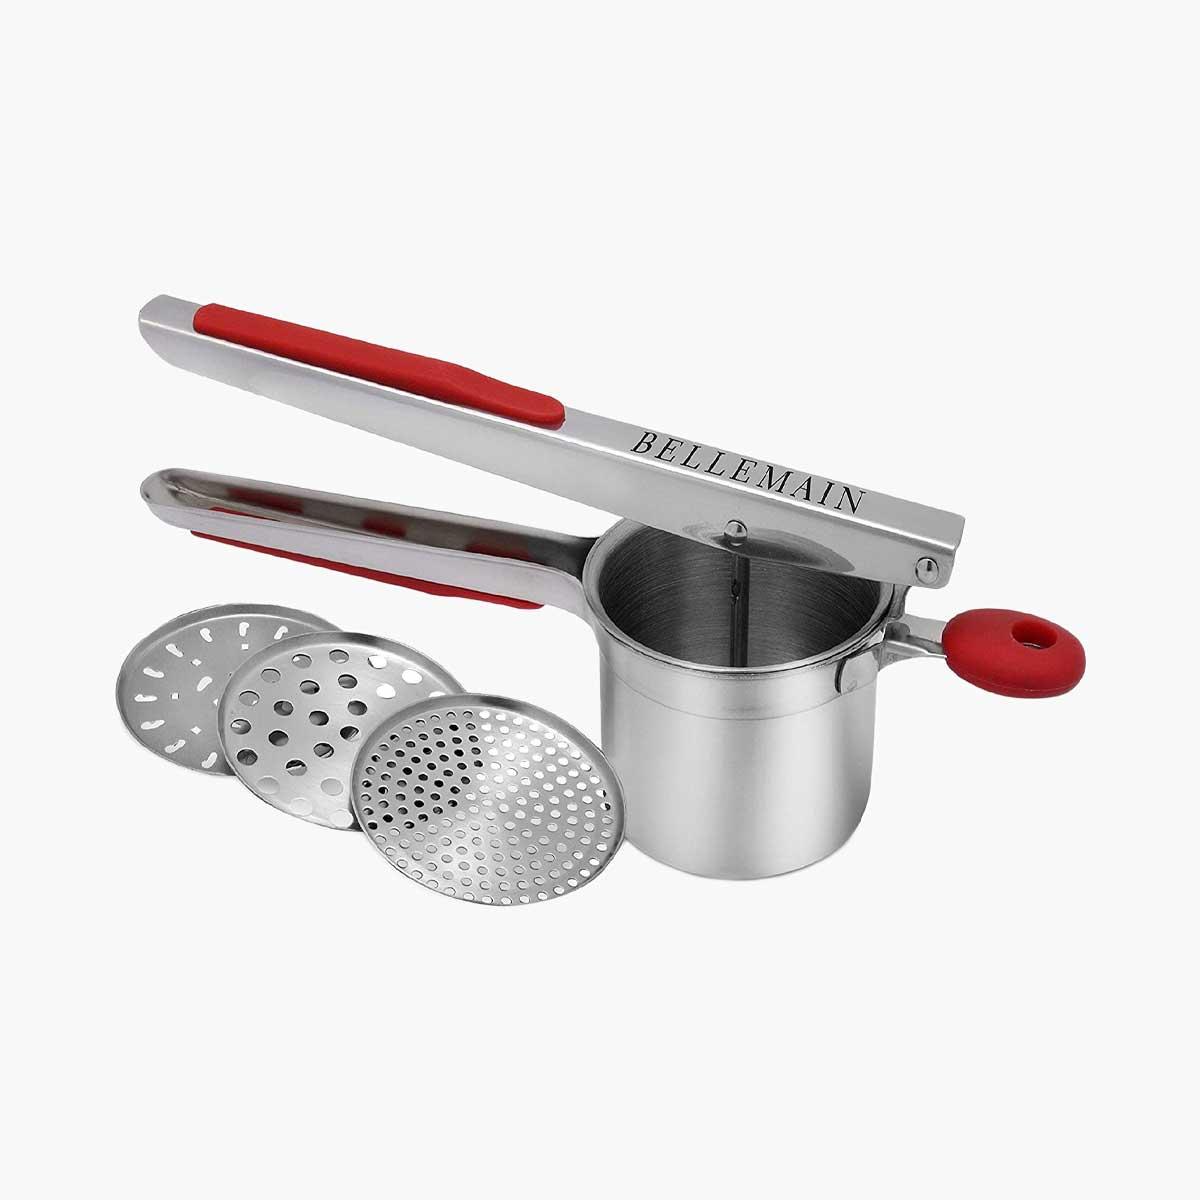 Bellemain Stainless Steel Potato Ricer Set